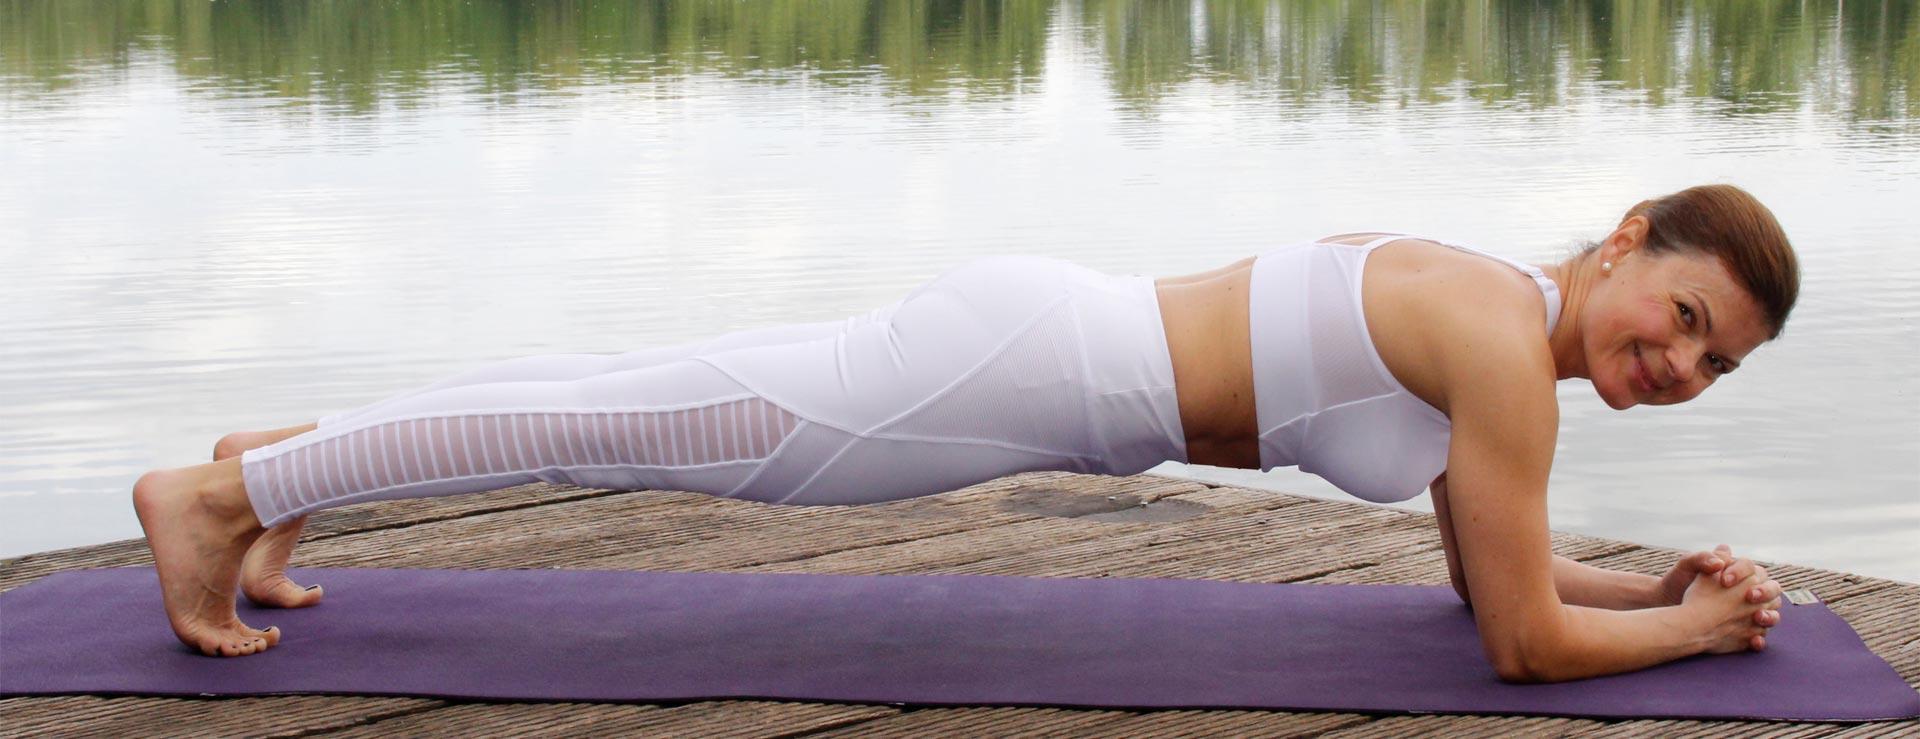 Yoga in Winsen Ueber mich